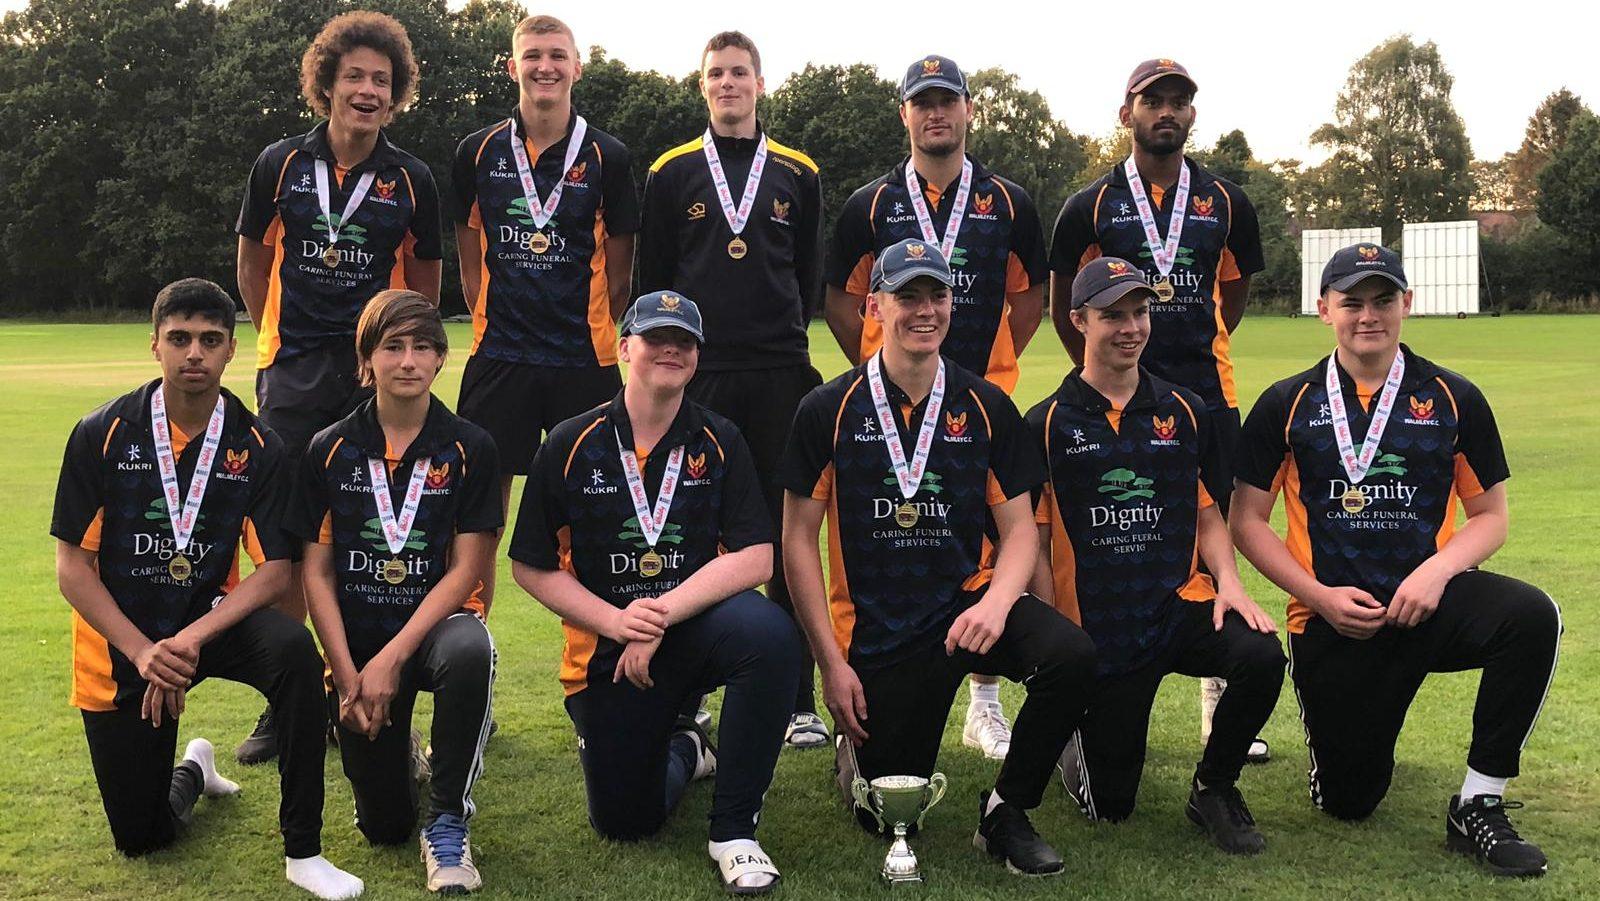 U19s Cup for Walmley